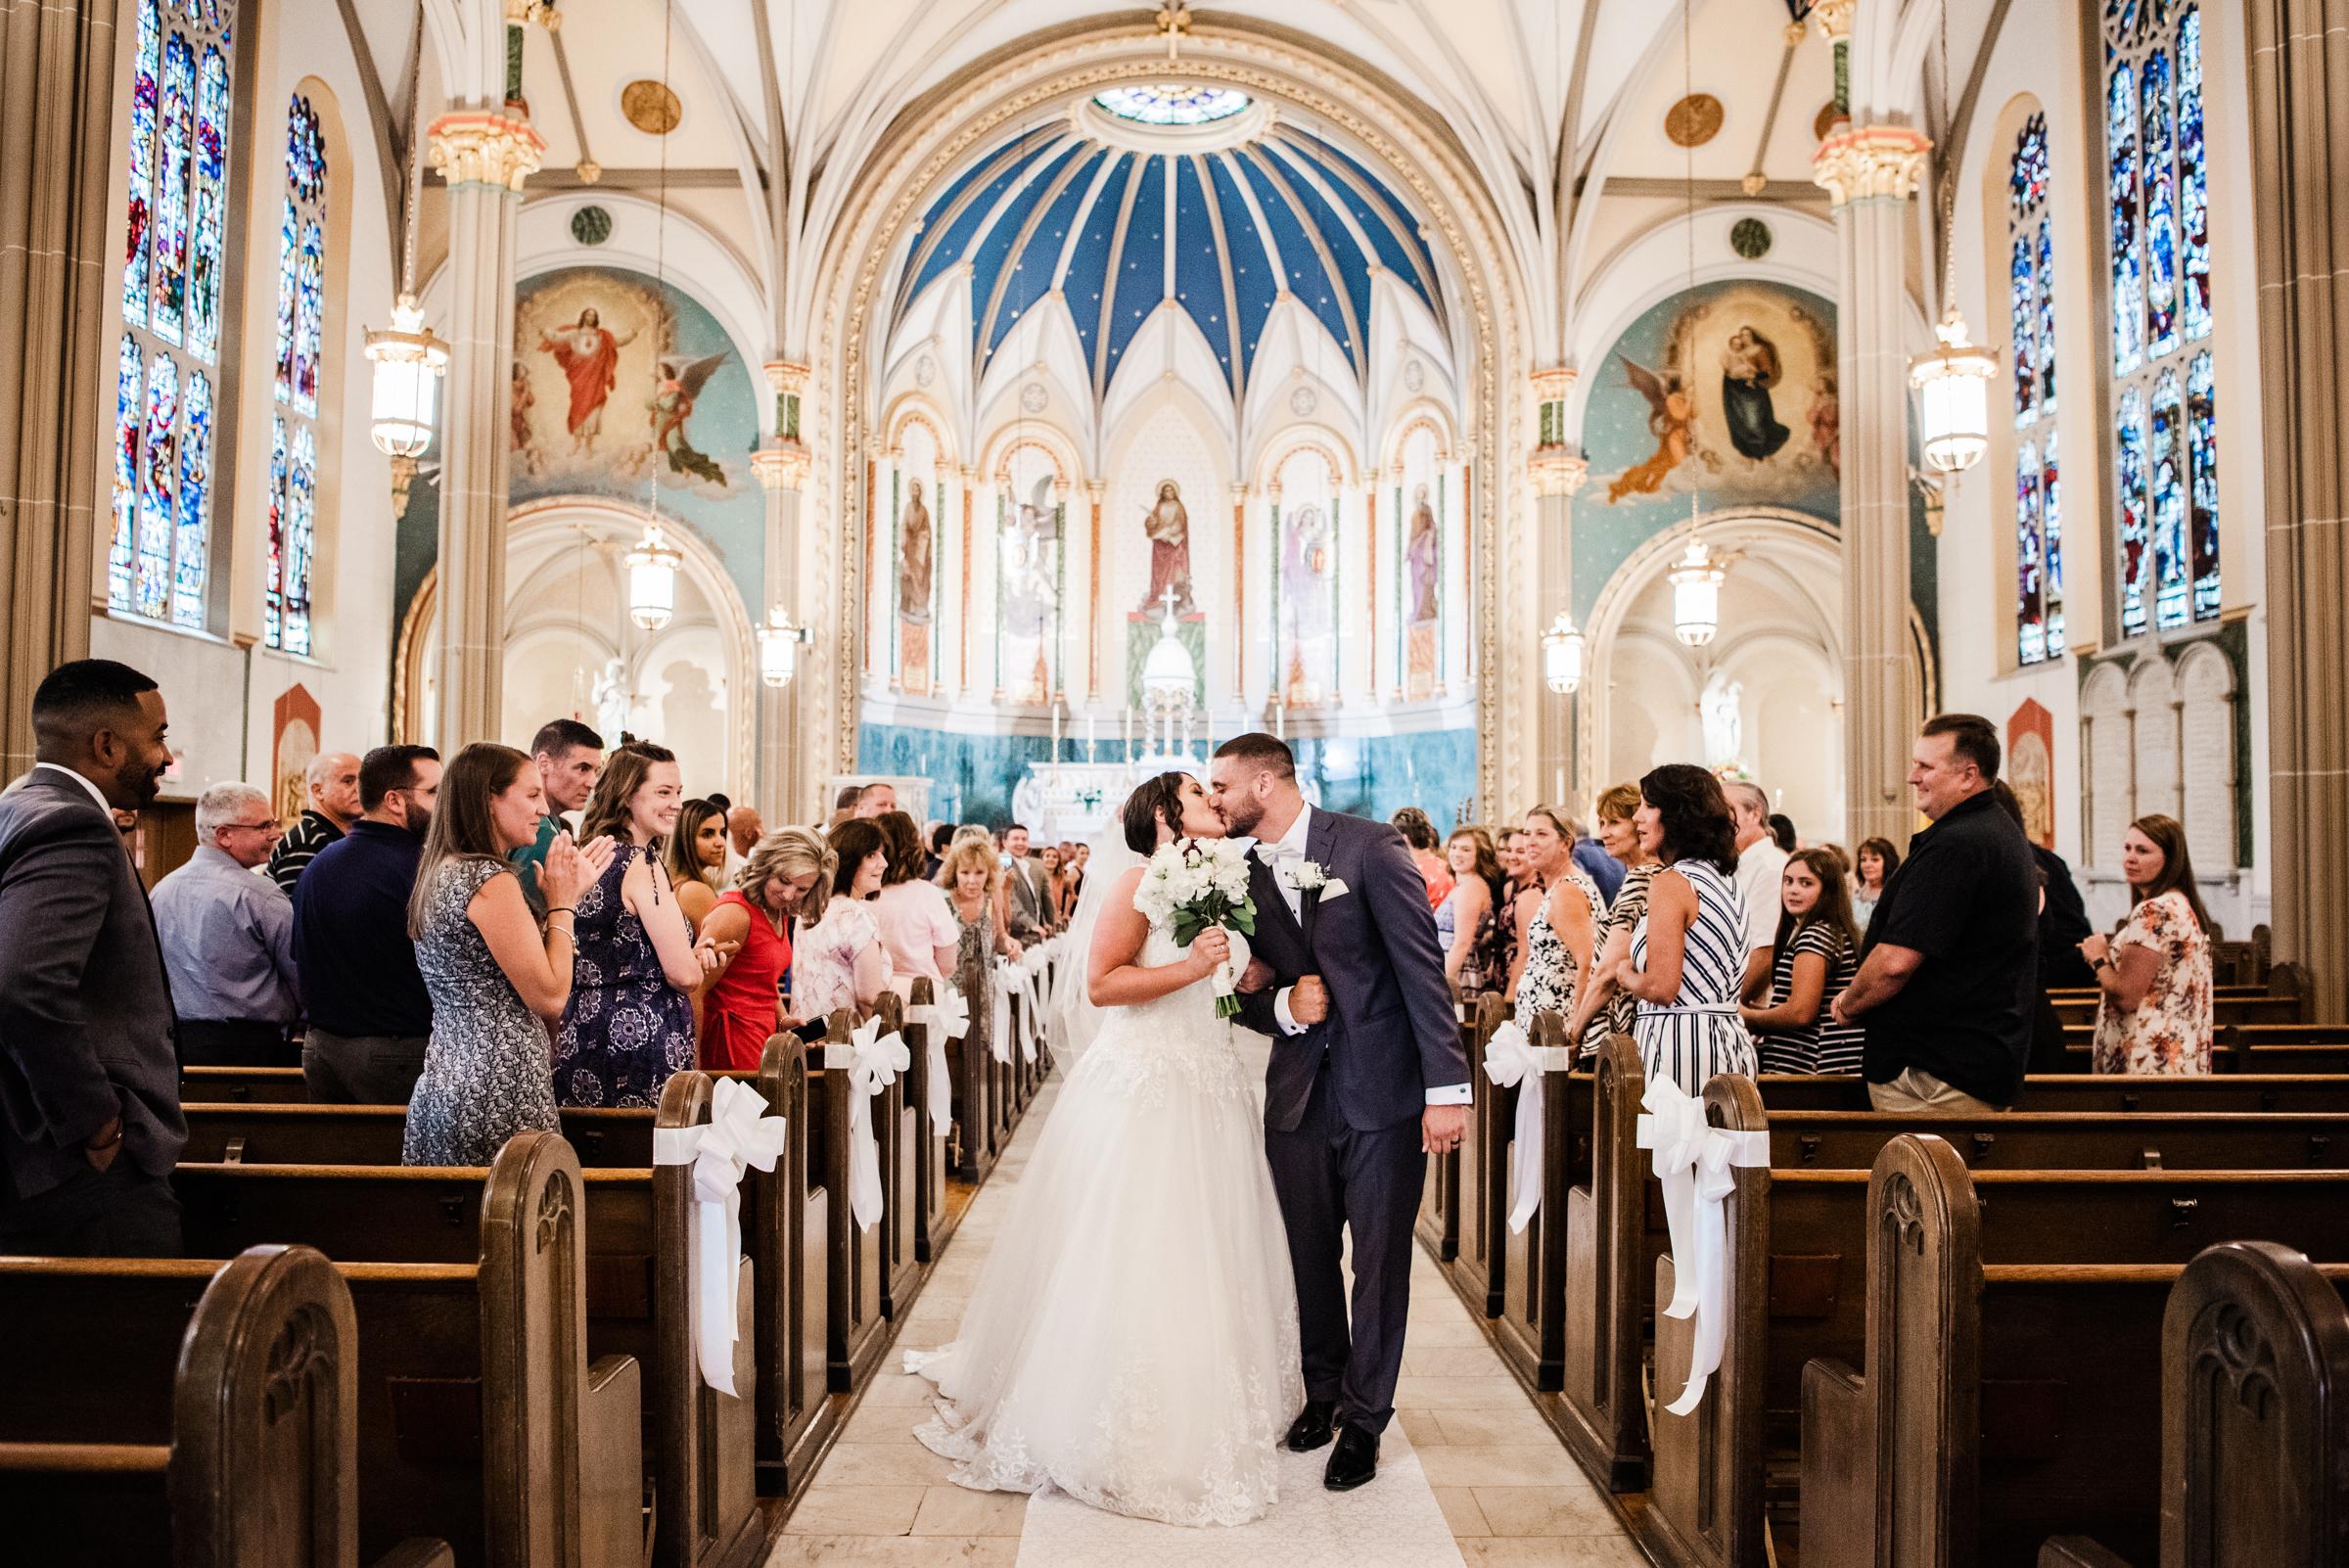 Historic_Old_St_Johns_Church_Valentinos_Banquet_Hall_Central_NY_Wedding_JILL_STUDIO_Rochester_NY_Photographer_DSC_5839.jpg